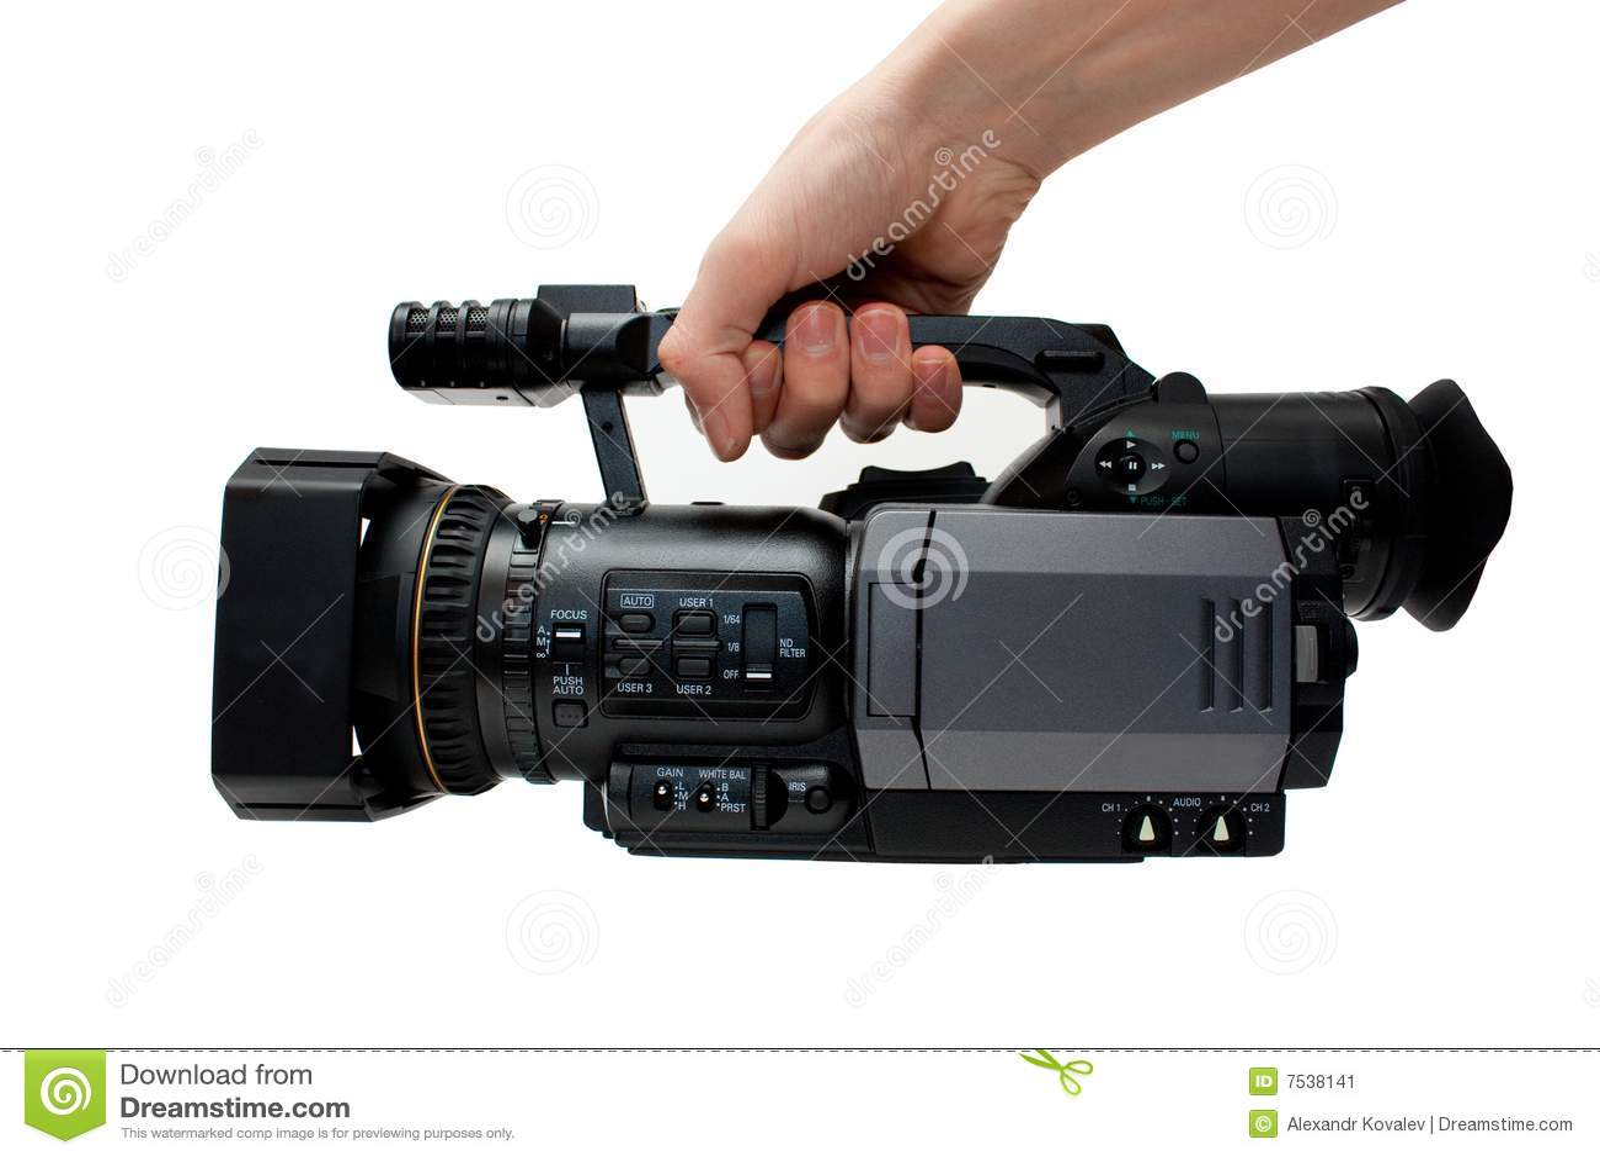 Professional Digital Video Camera Stock Image - Image: 7538141